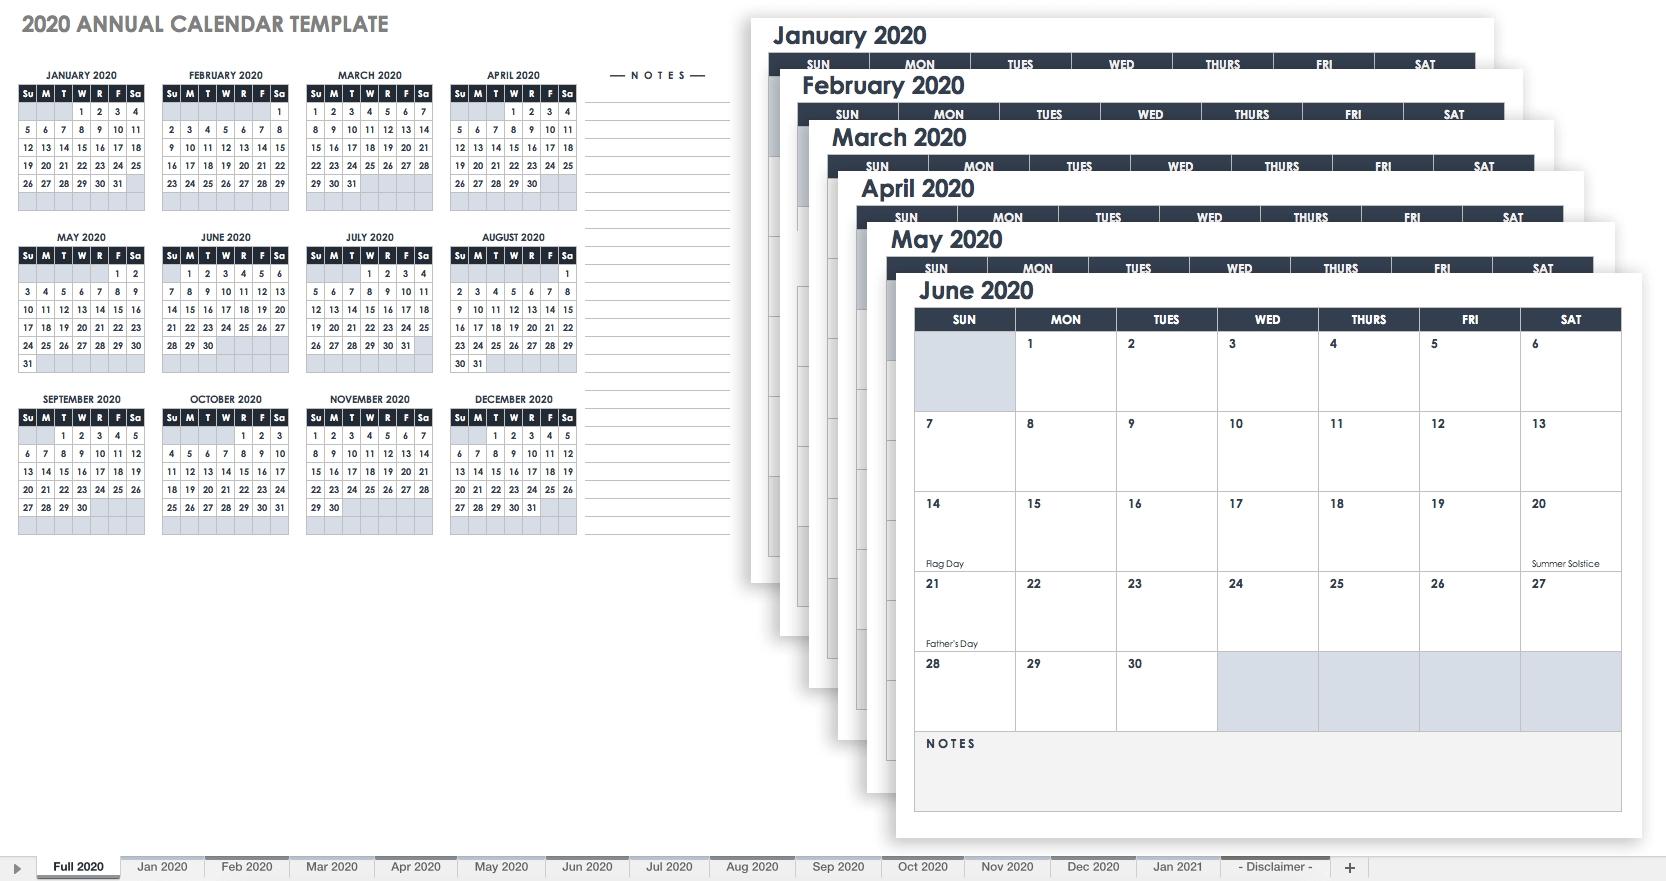 Free Blank Calendar Templates - Smartsheet inside Calendar For Employees Vacation List